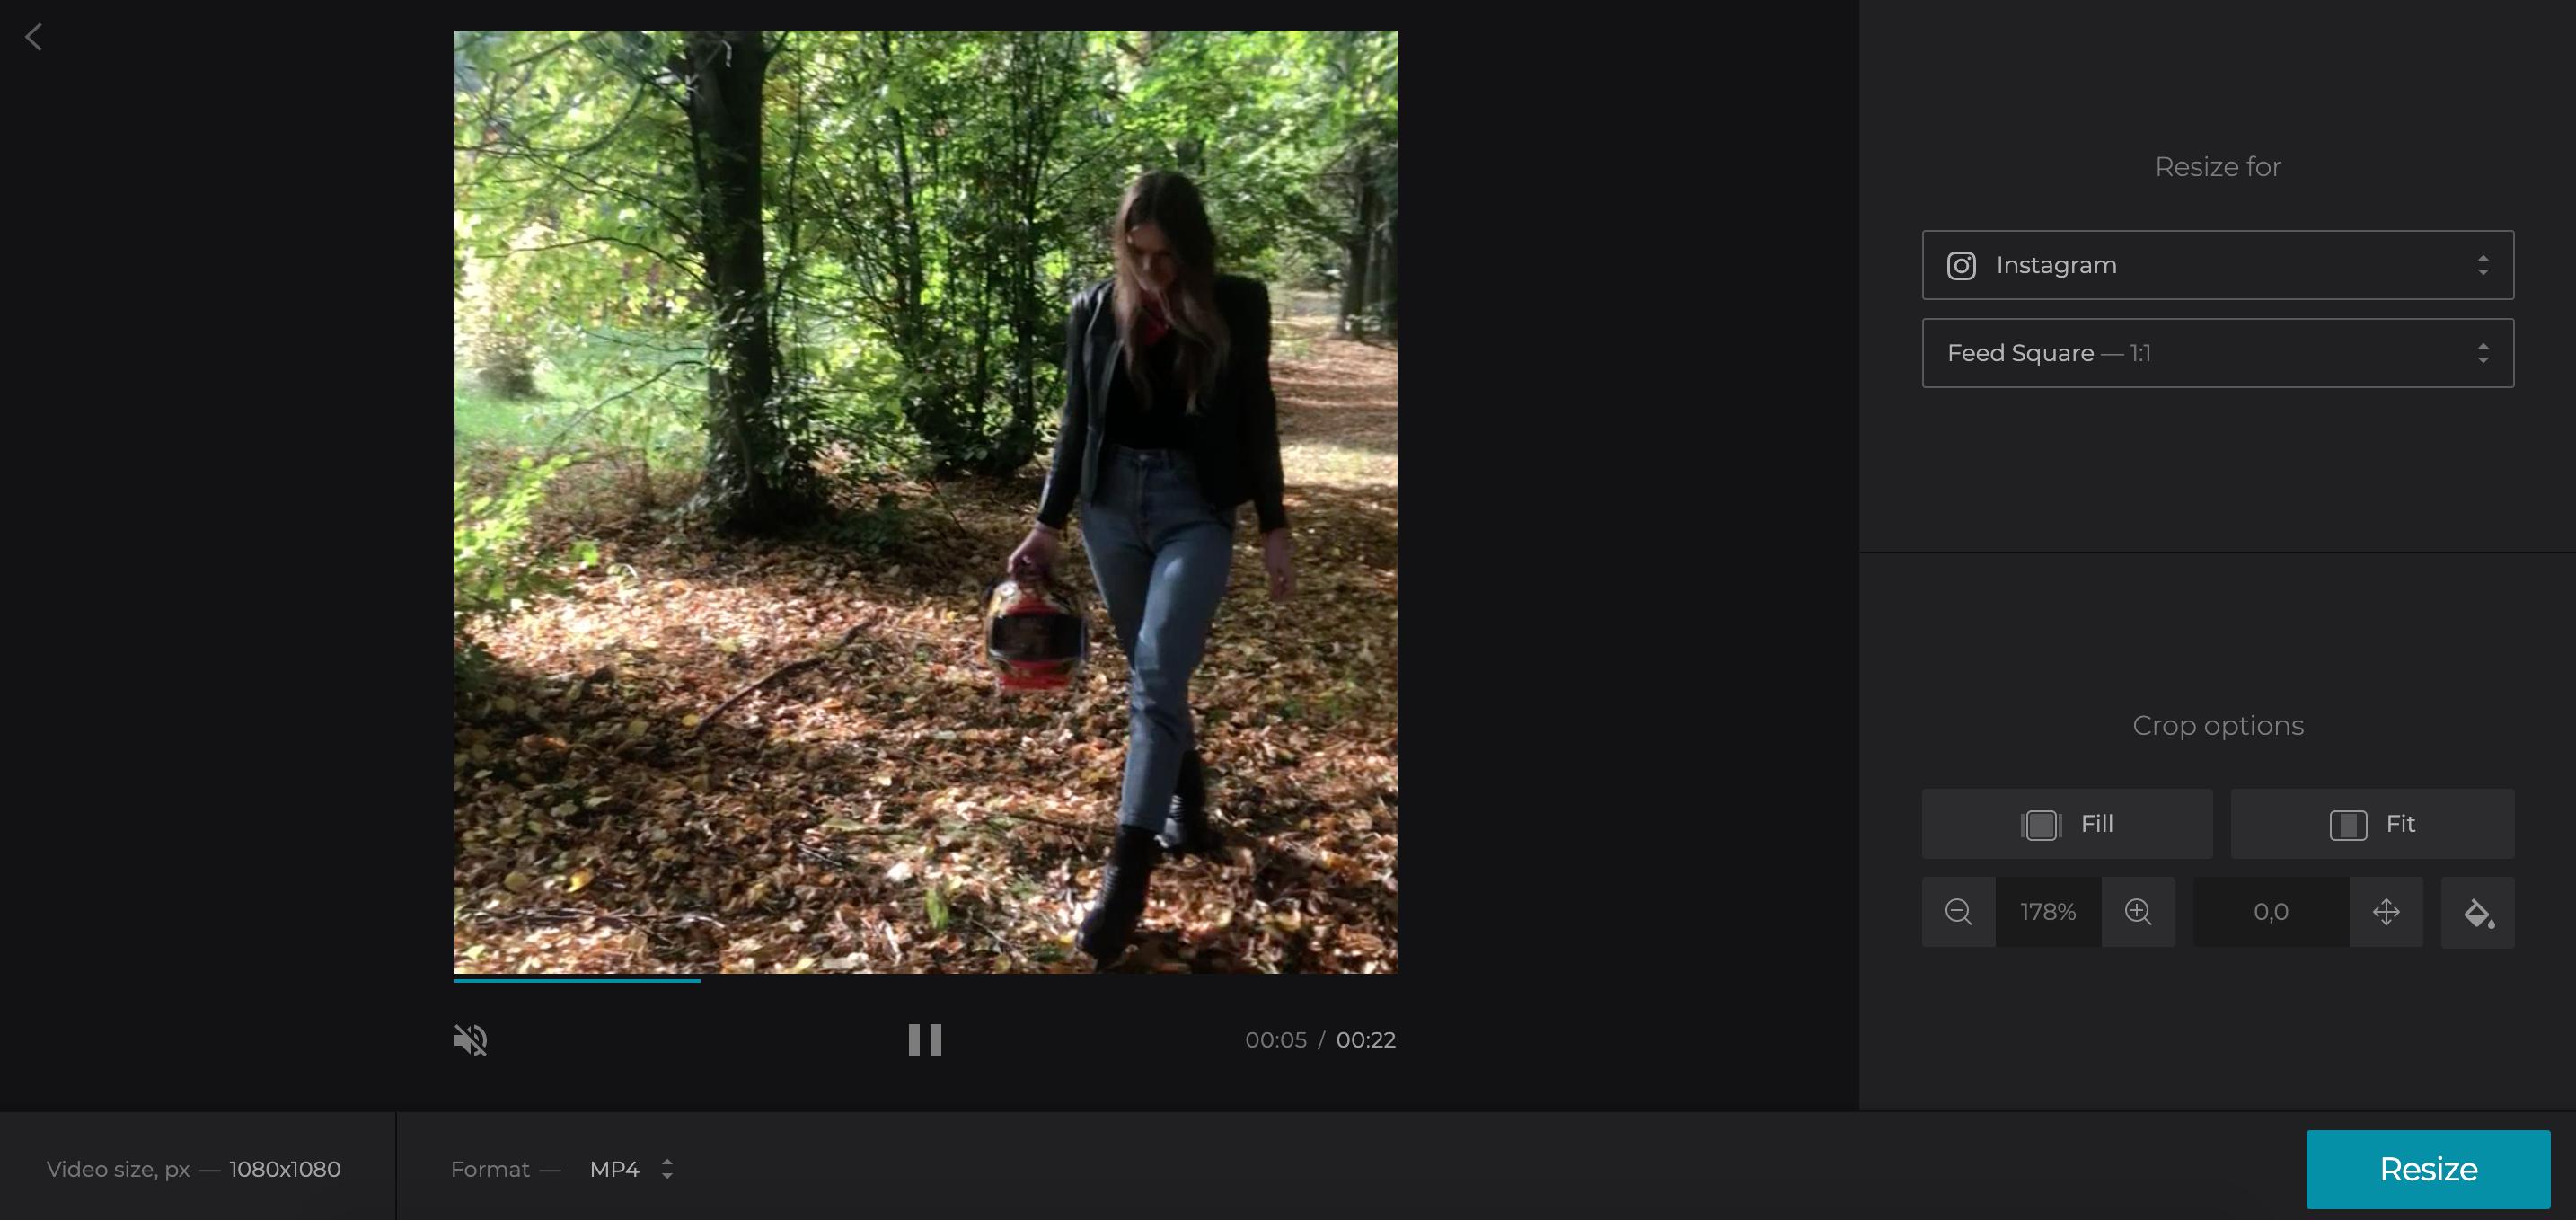 Crop Vimeo video to share on Instagram